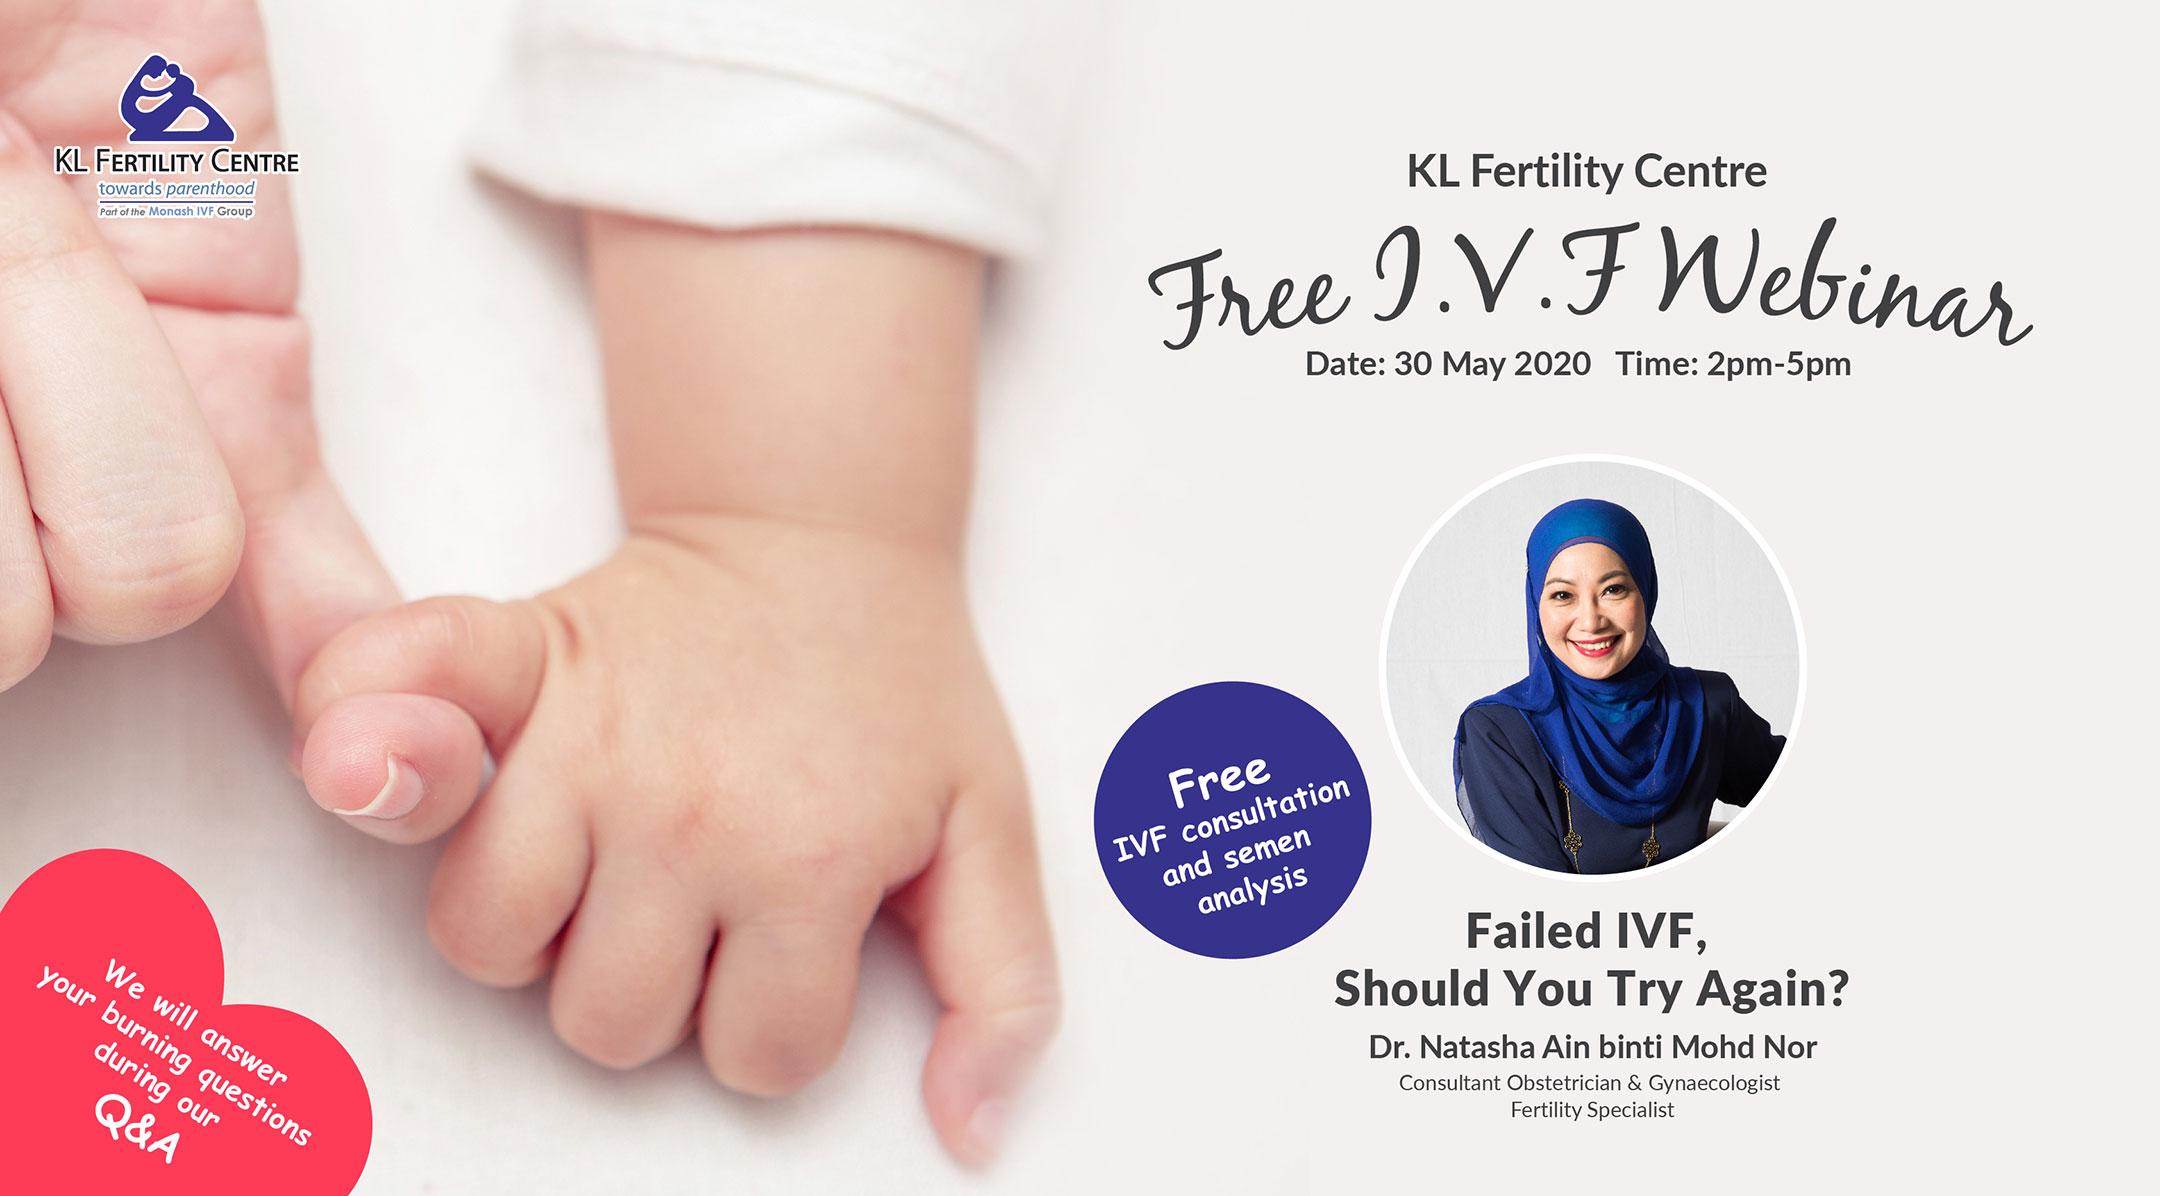 Free IVF Webinar 30 May 2020 - Dr. Natasha Ain binti Mohd Nor